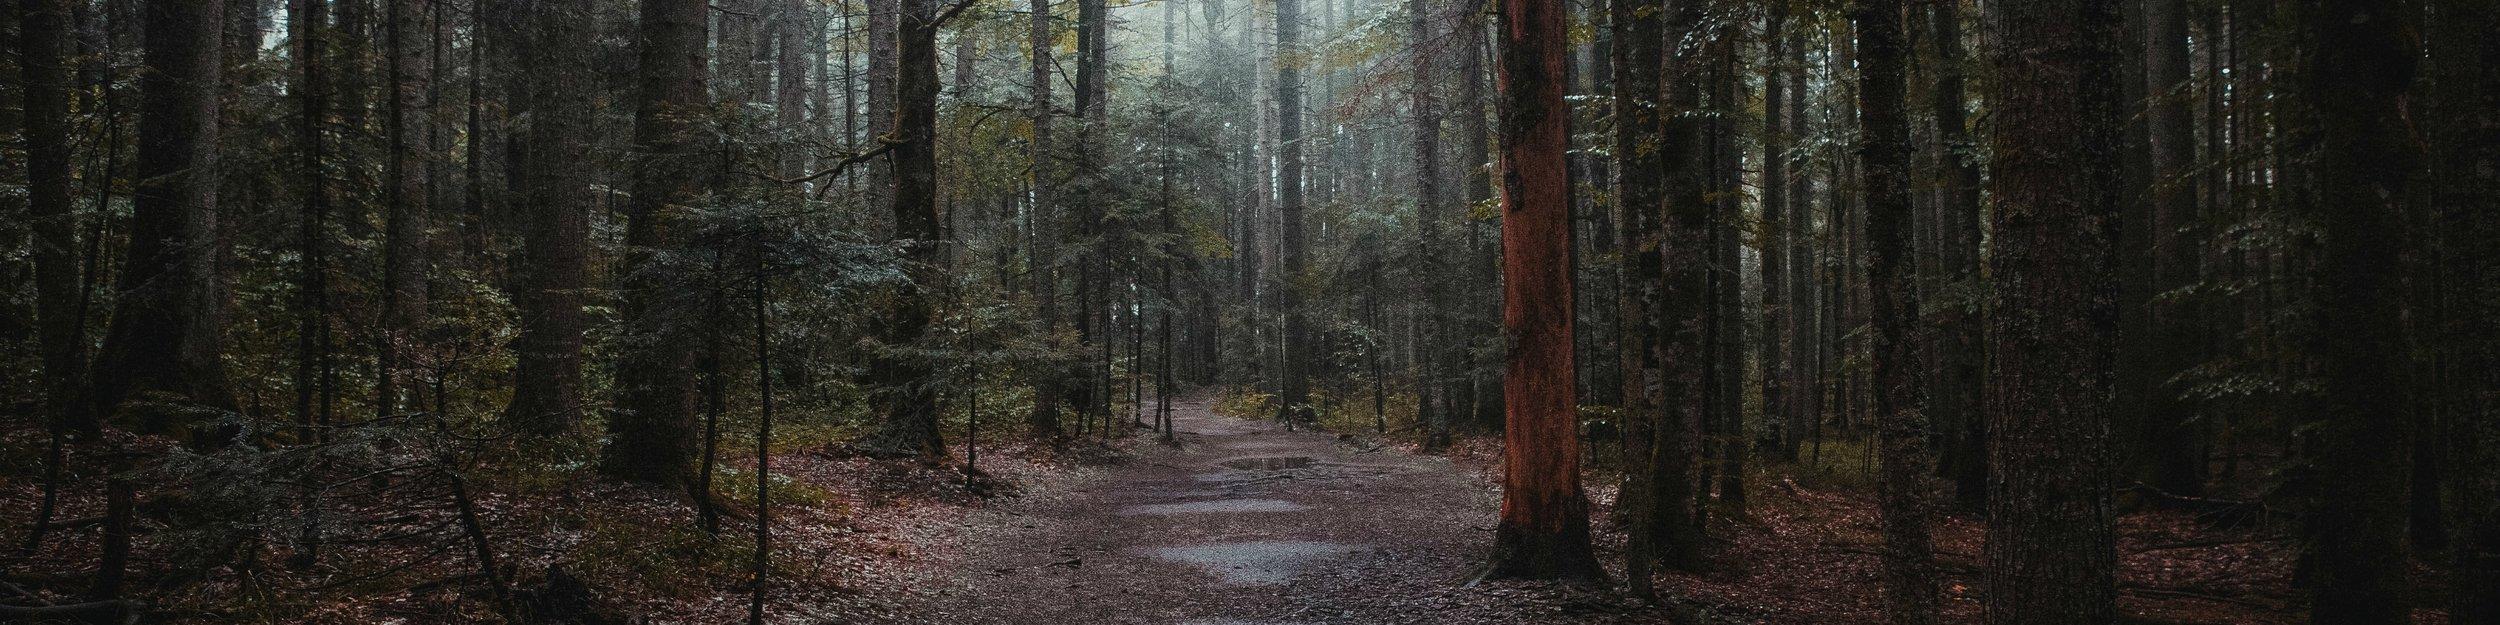 forest long-min.jpg